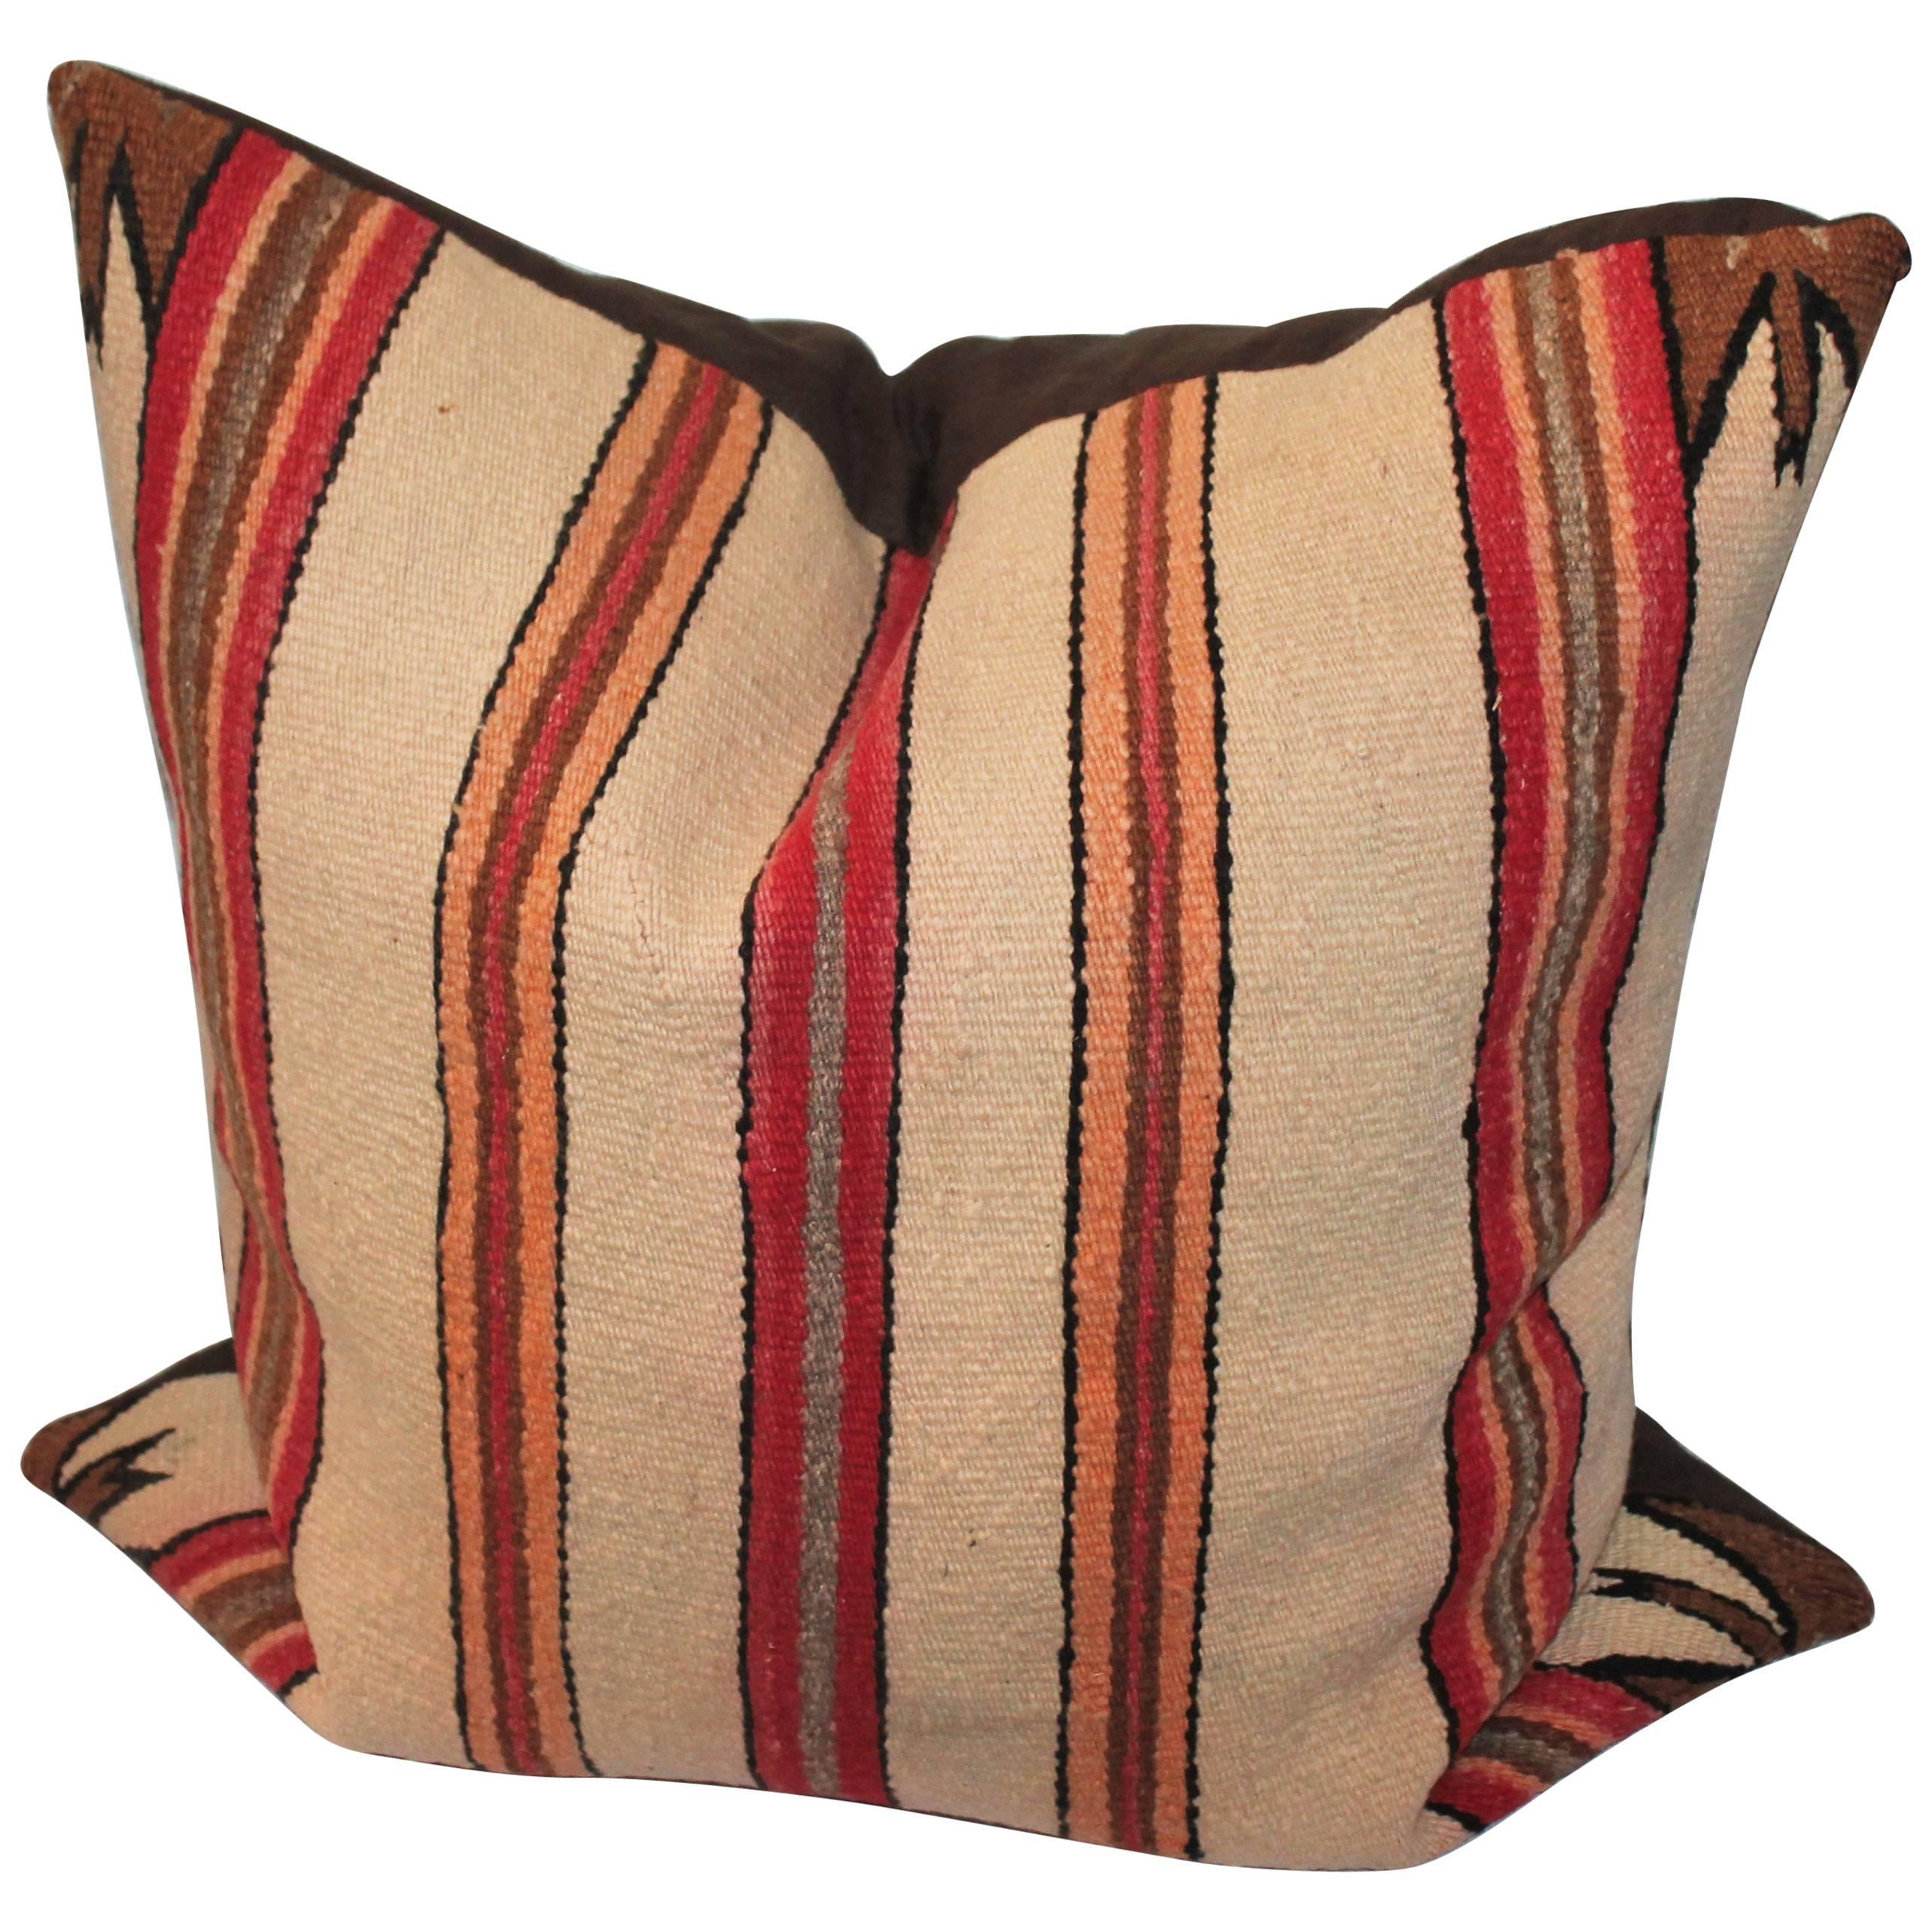 Monumental Early Navajo Saddle Blanket Weaving